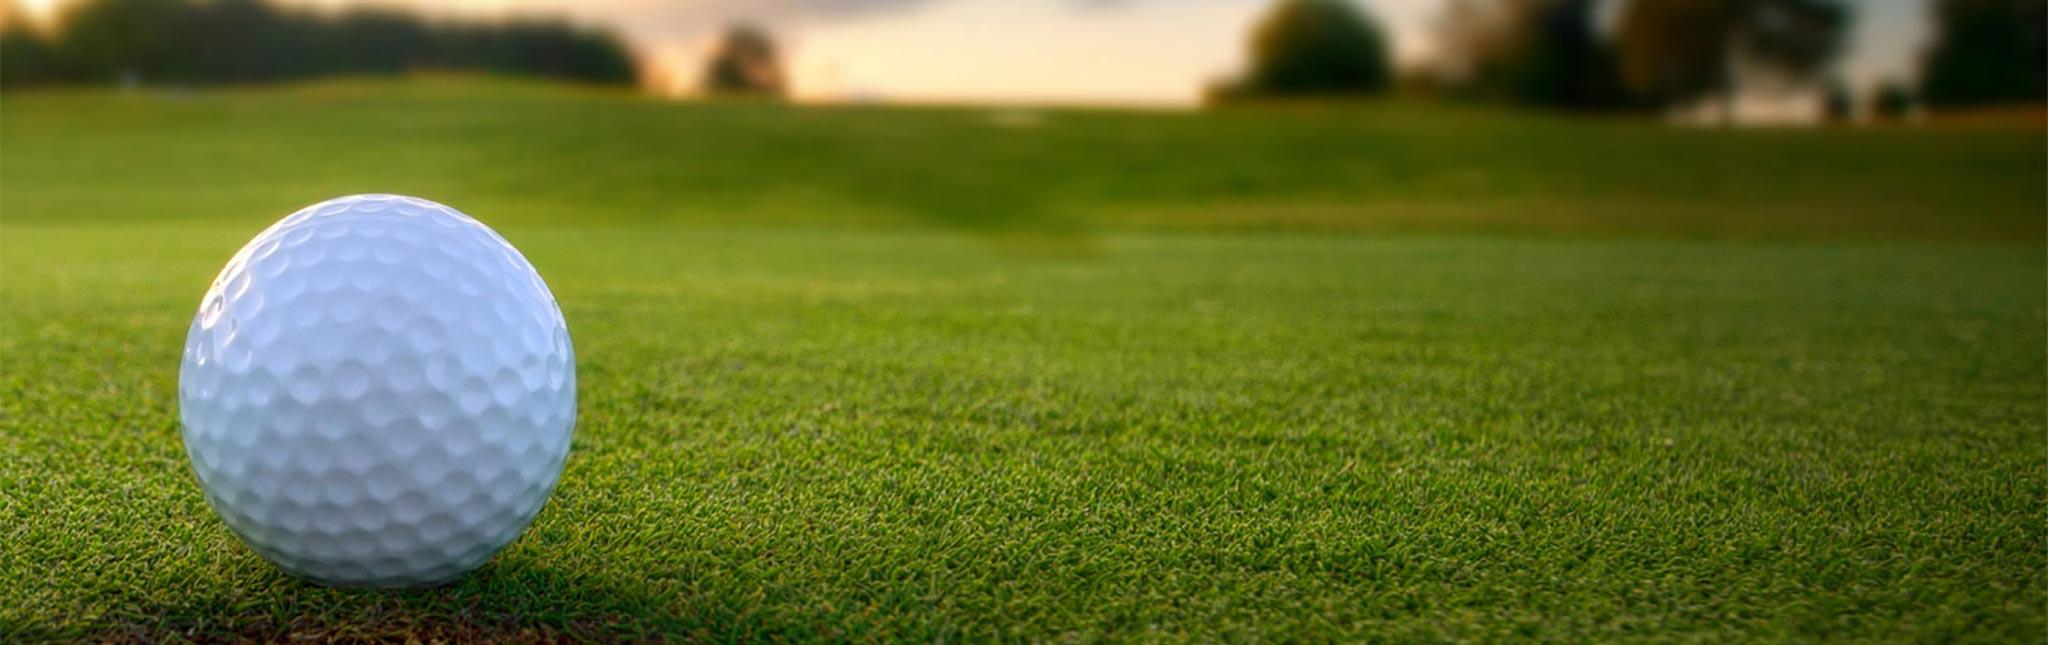 golf_ball_left2048x645.jpg